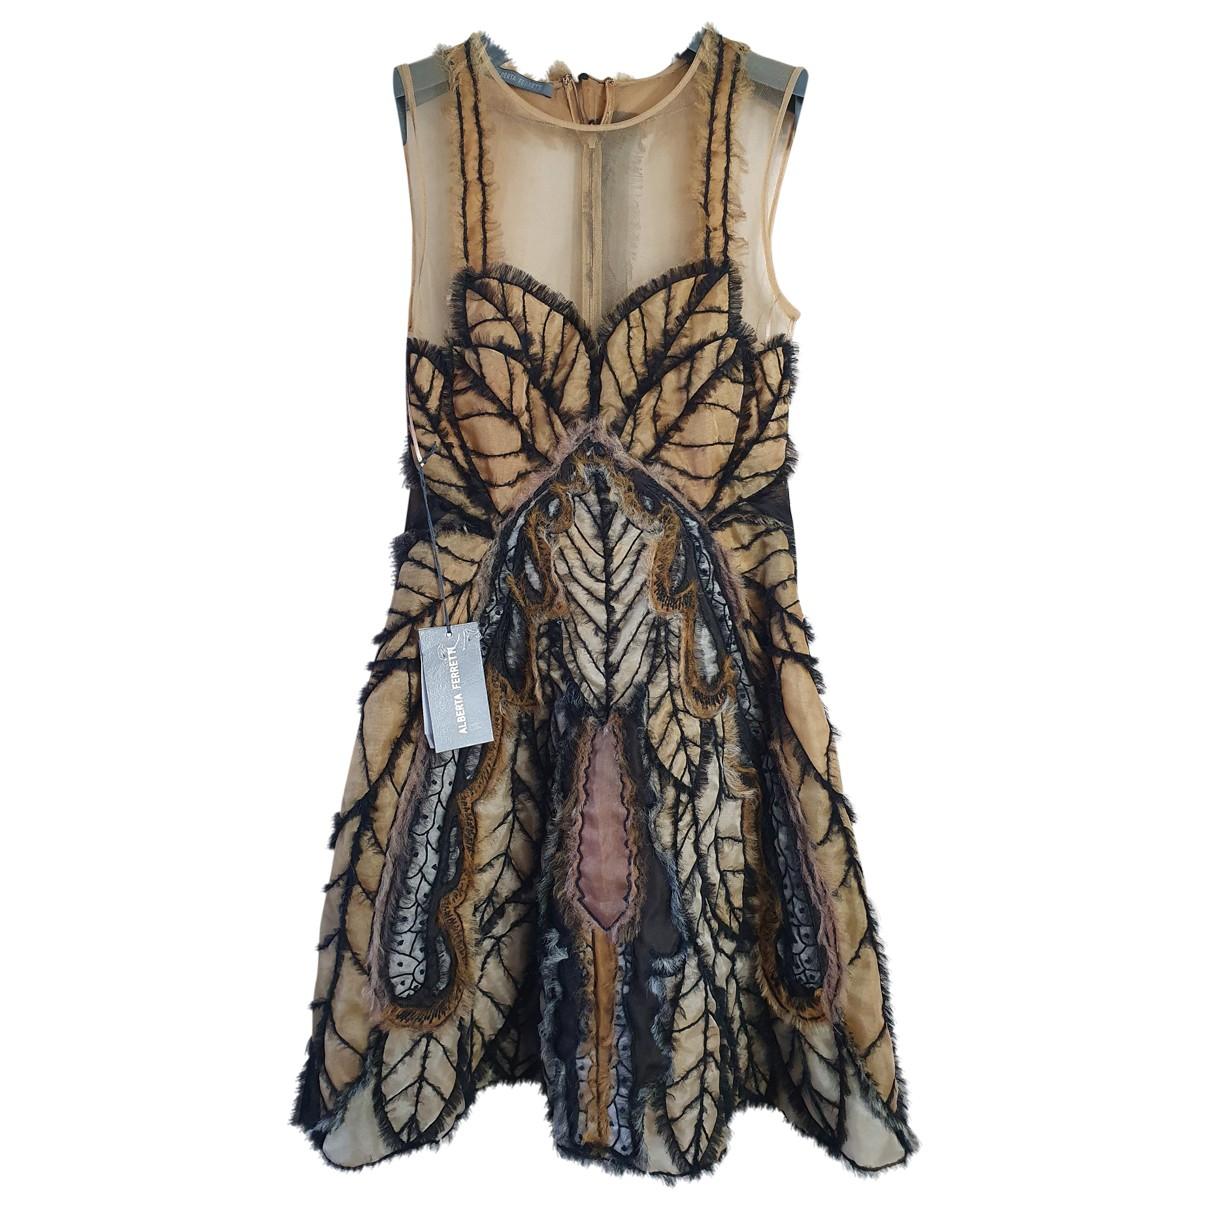 Alberta Ferretti \N Beige Silk dress for Women 38 IT